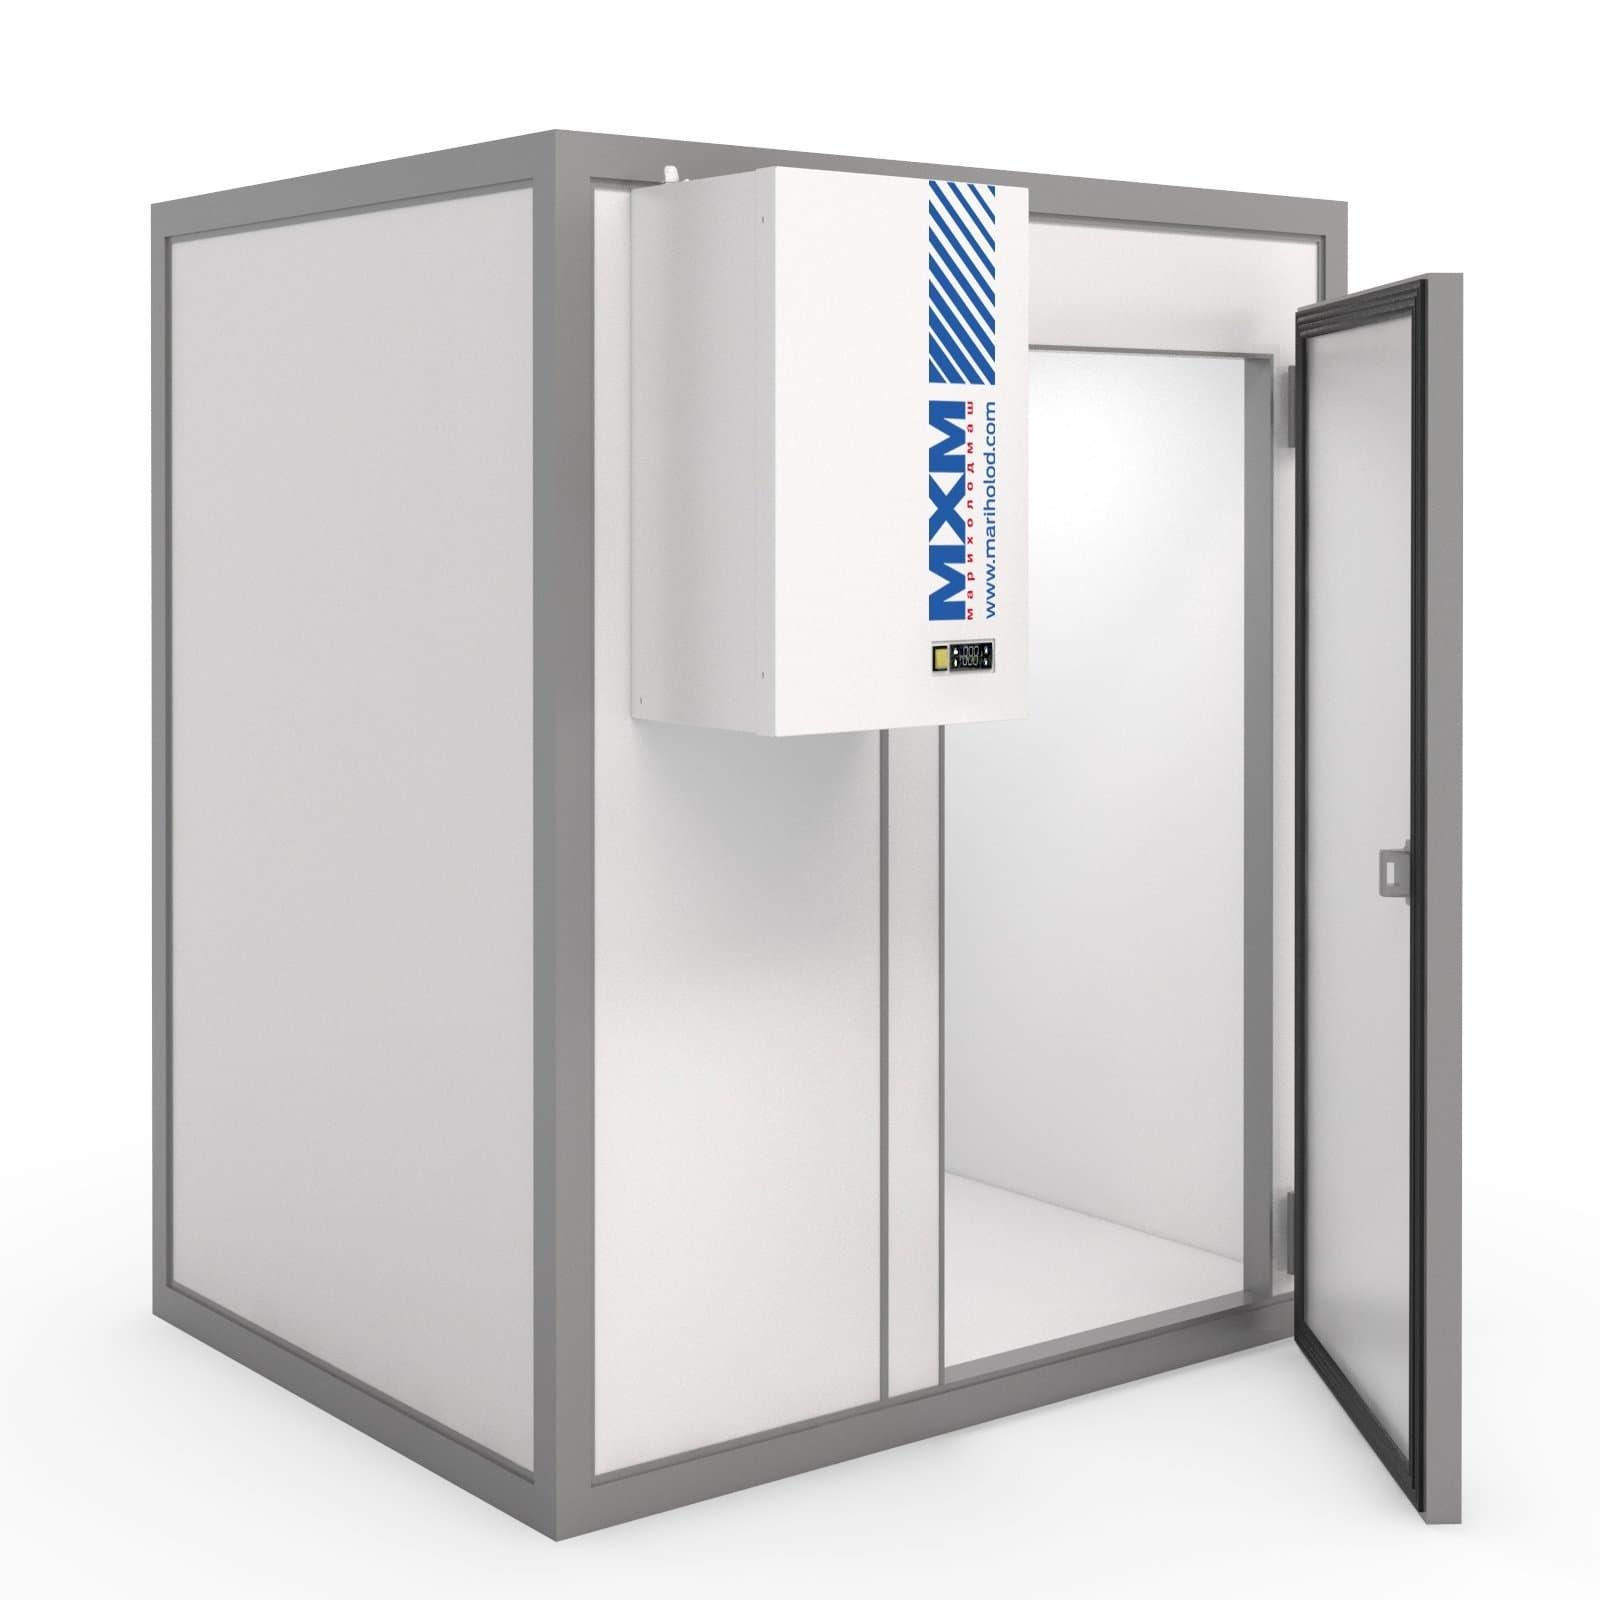 Камера холодильная МХМ КХН-21,11 1660×7060×2200